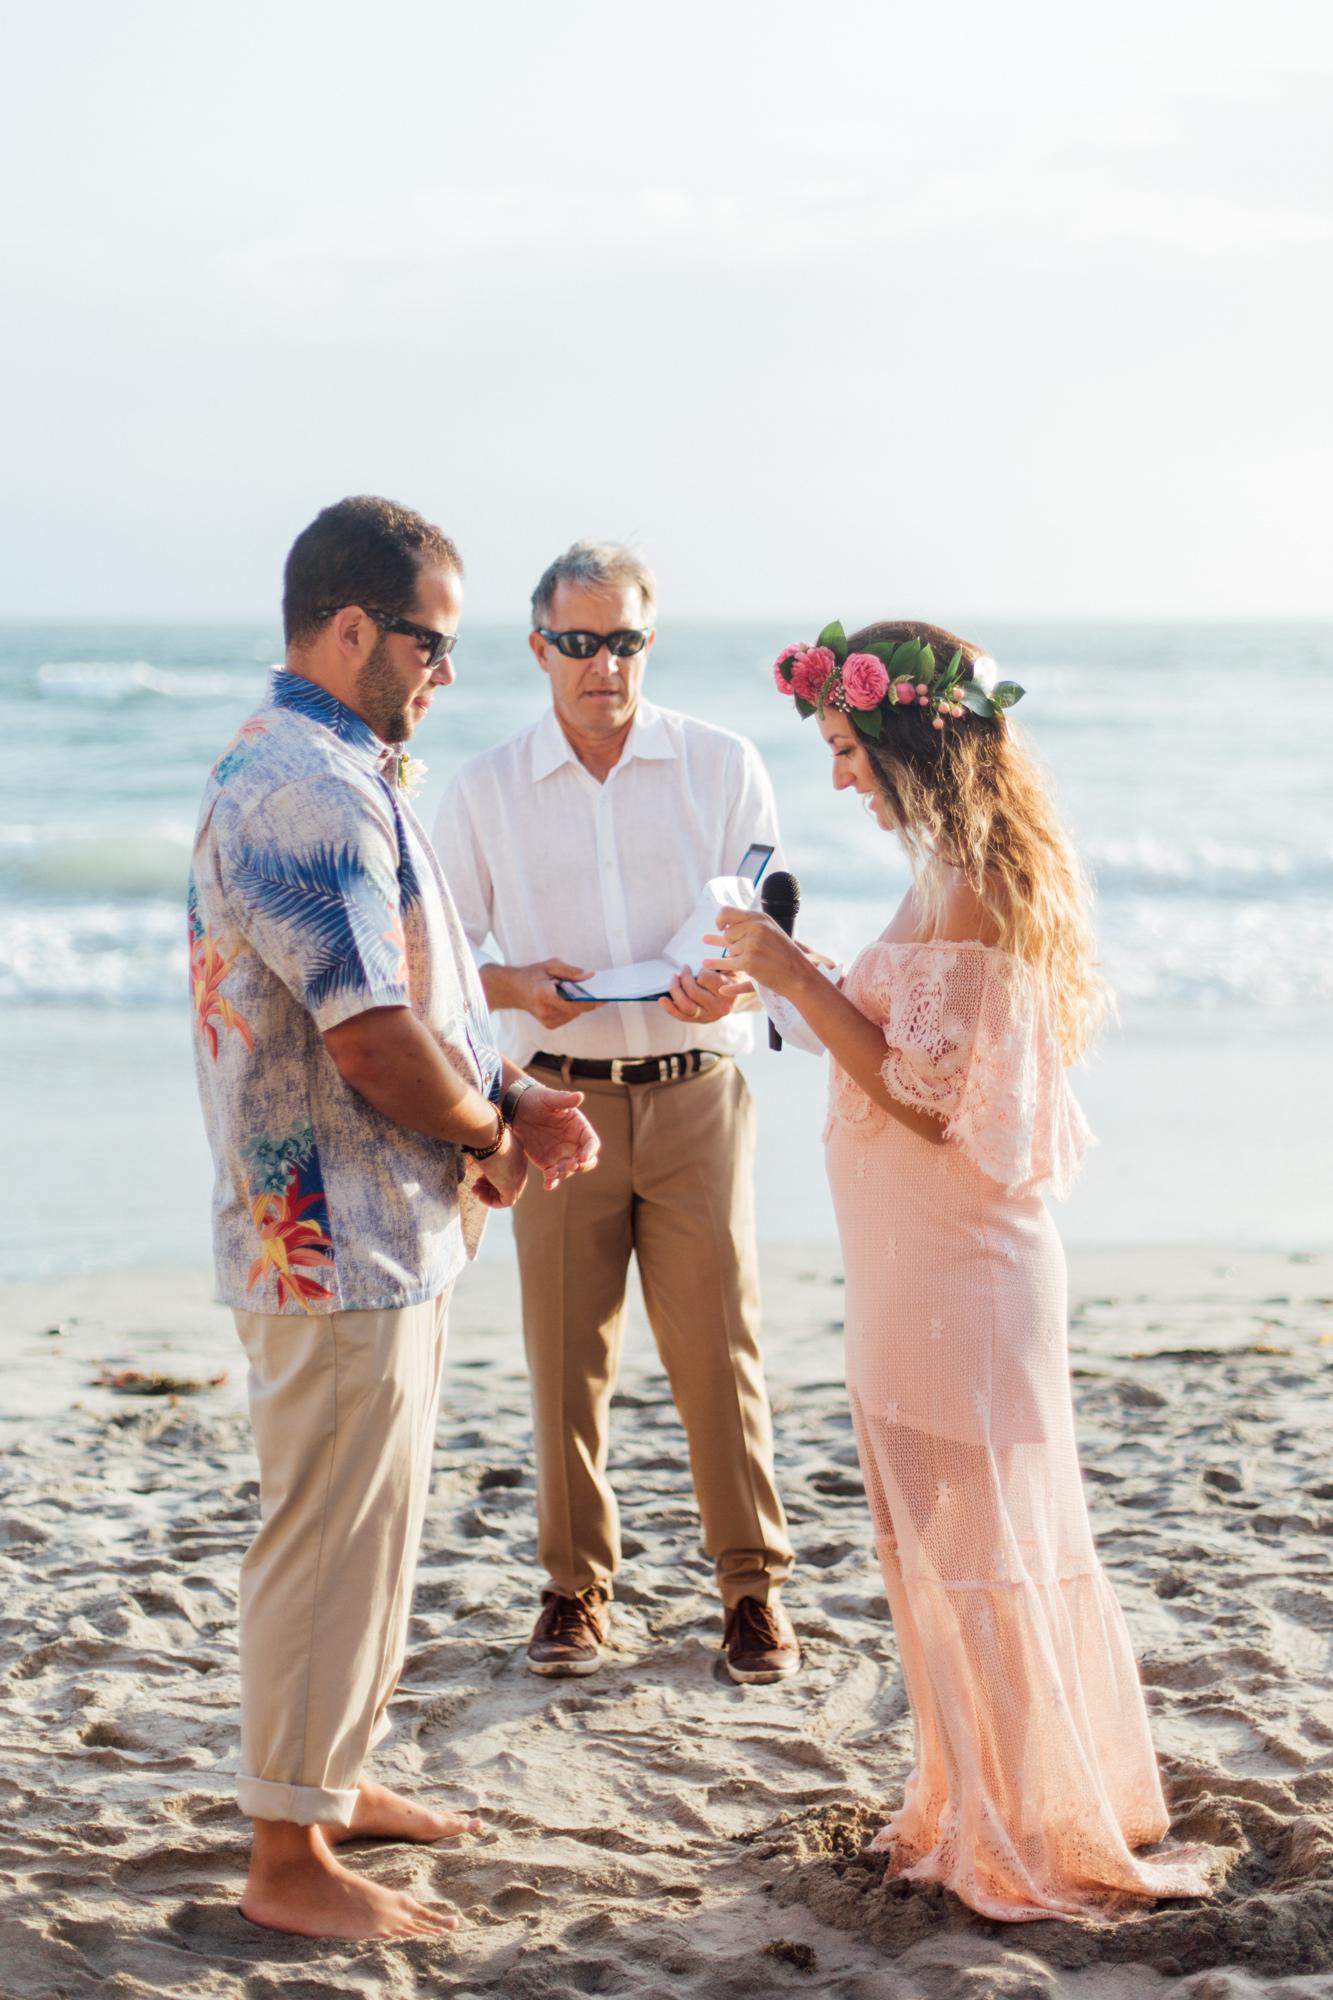 San Diego Wedding photography at Cardiff Beach020.jpg